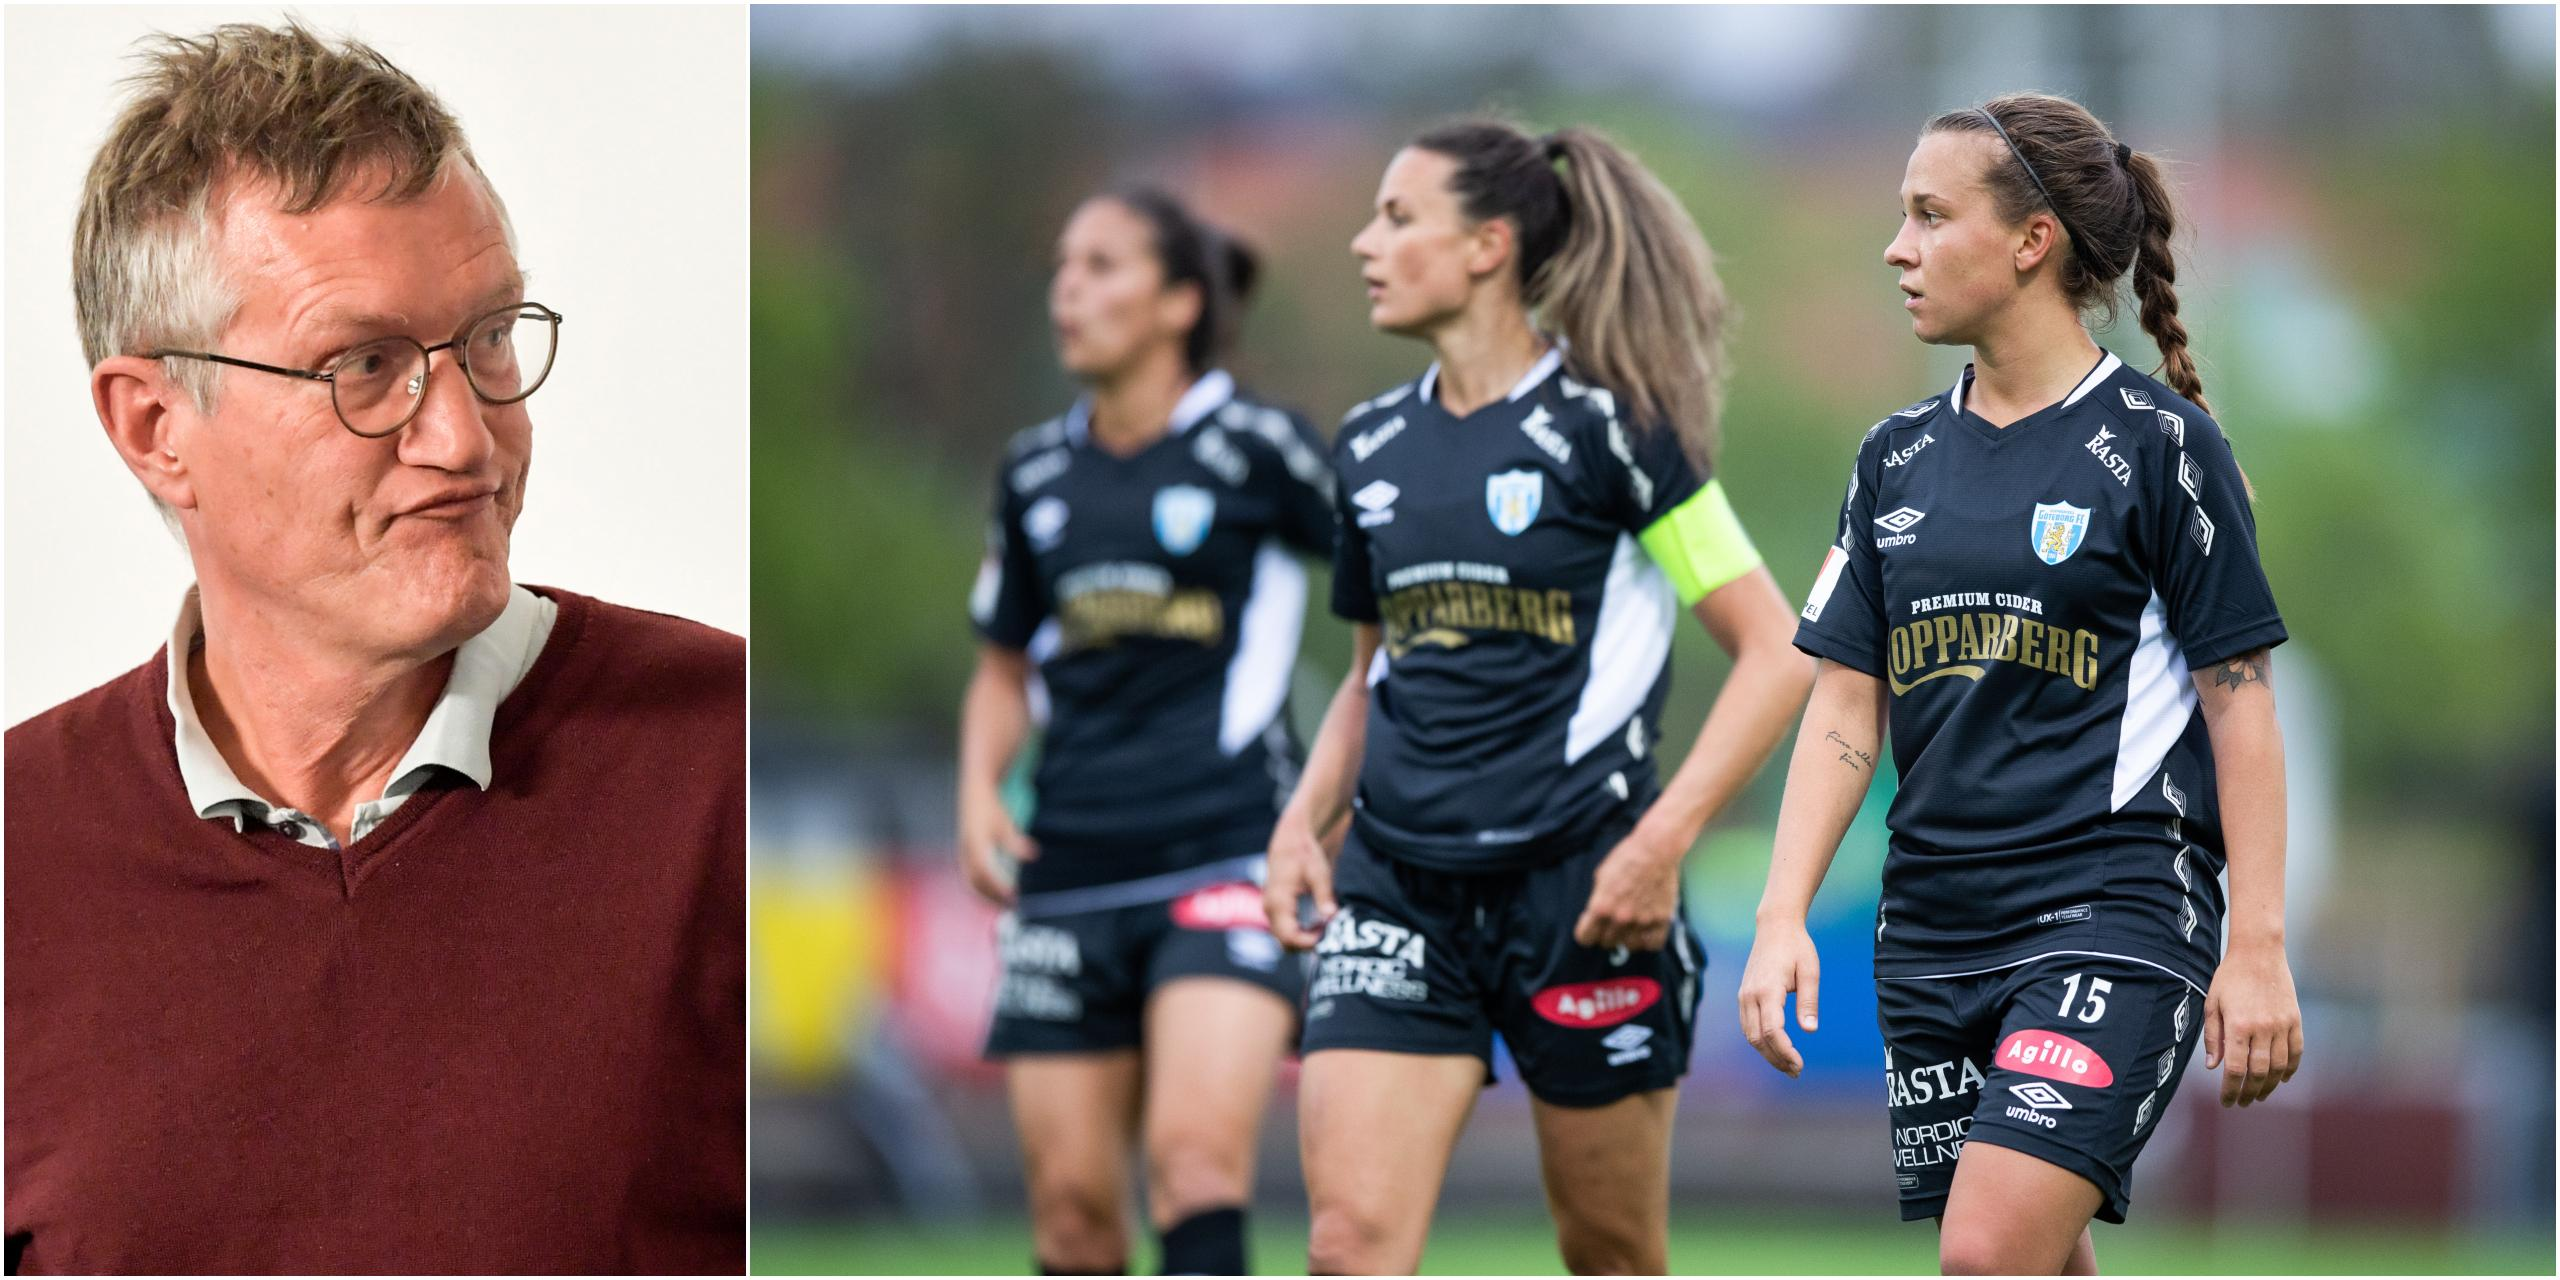 Anders Tegnell dömer ut fotbollsstart i månadsskiftet